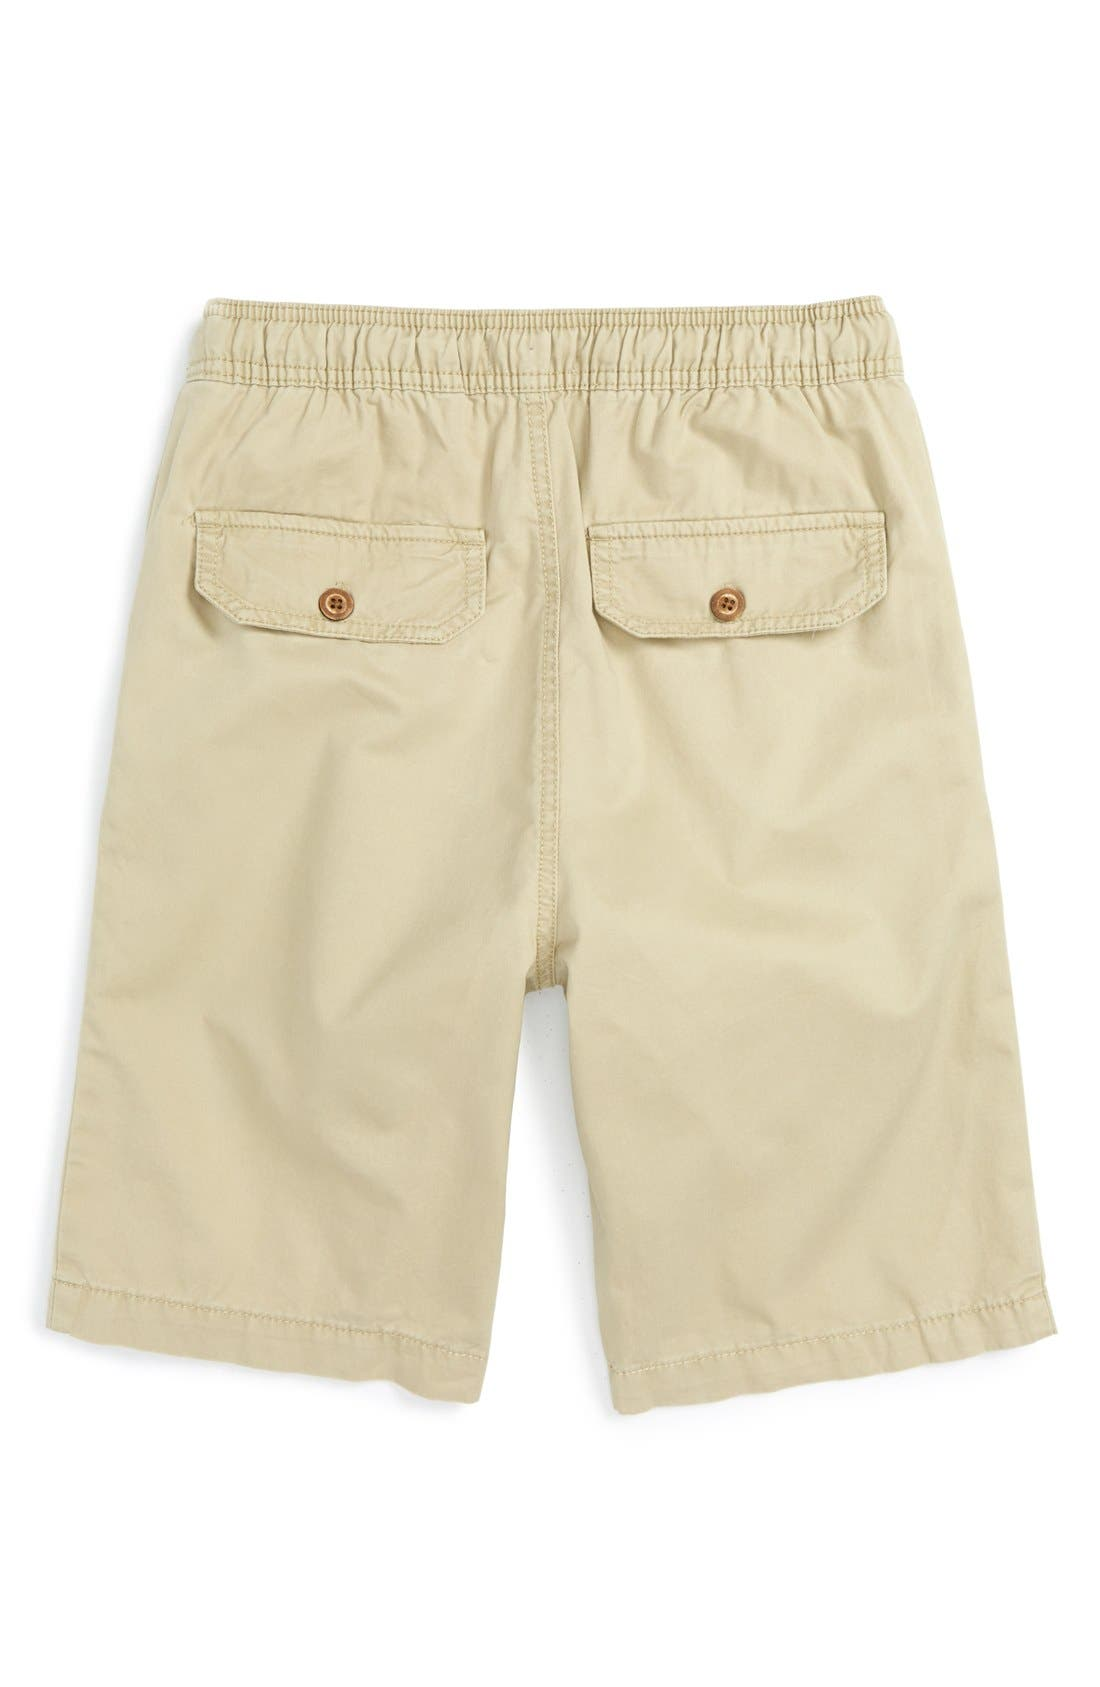 Alternate Image 2  - Tucker + Tate Cotton Twill Shorts (Toddler Boys, Little Boys & Big Boys)